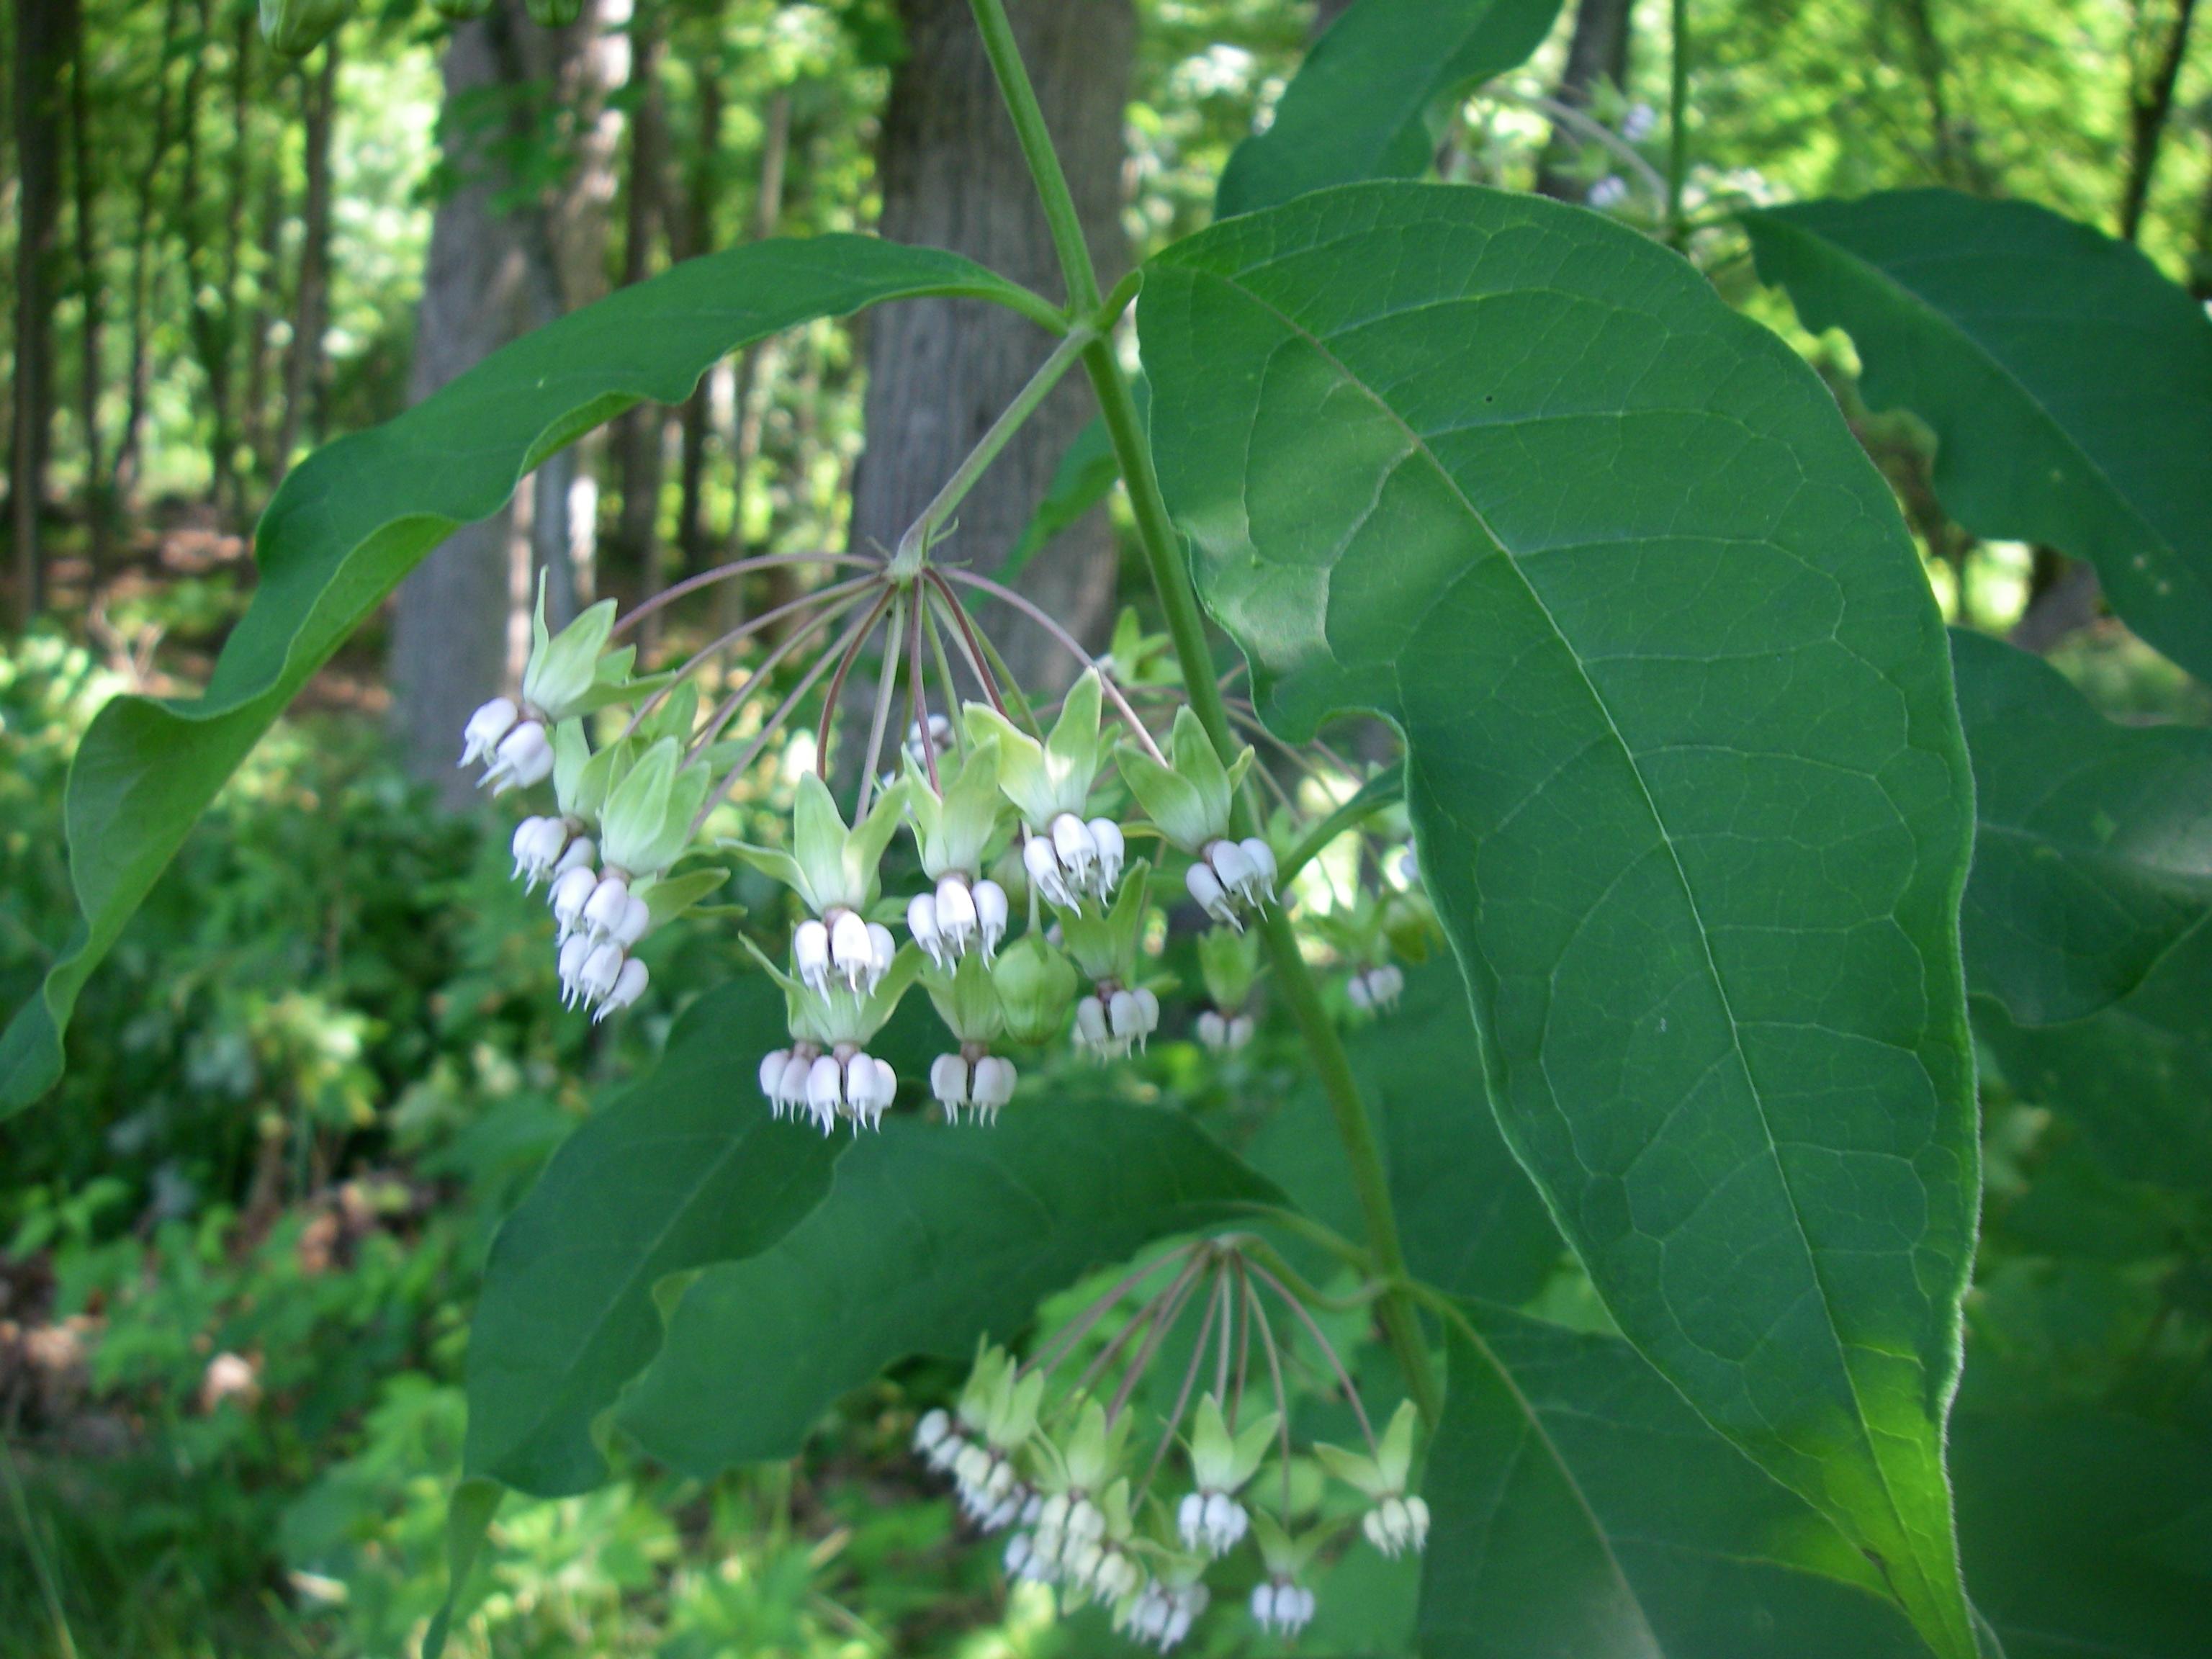 More Fireworks No Milkweed And We Need >> Milkweed Fireworks Natural Areas Notebook